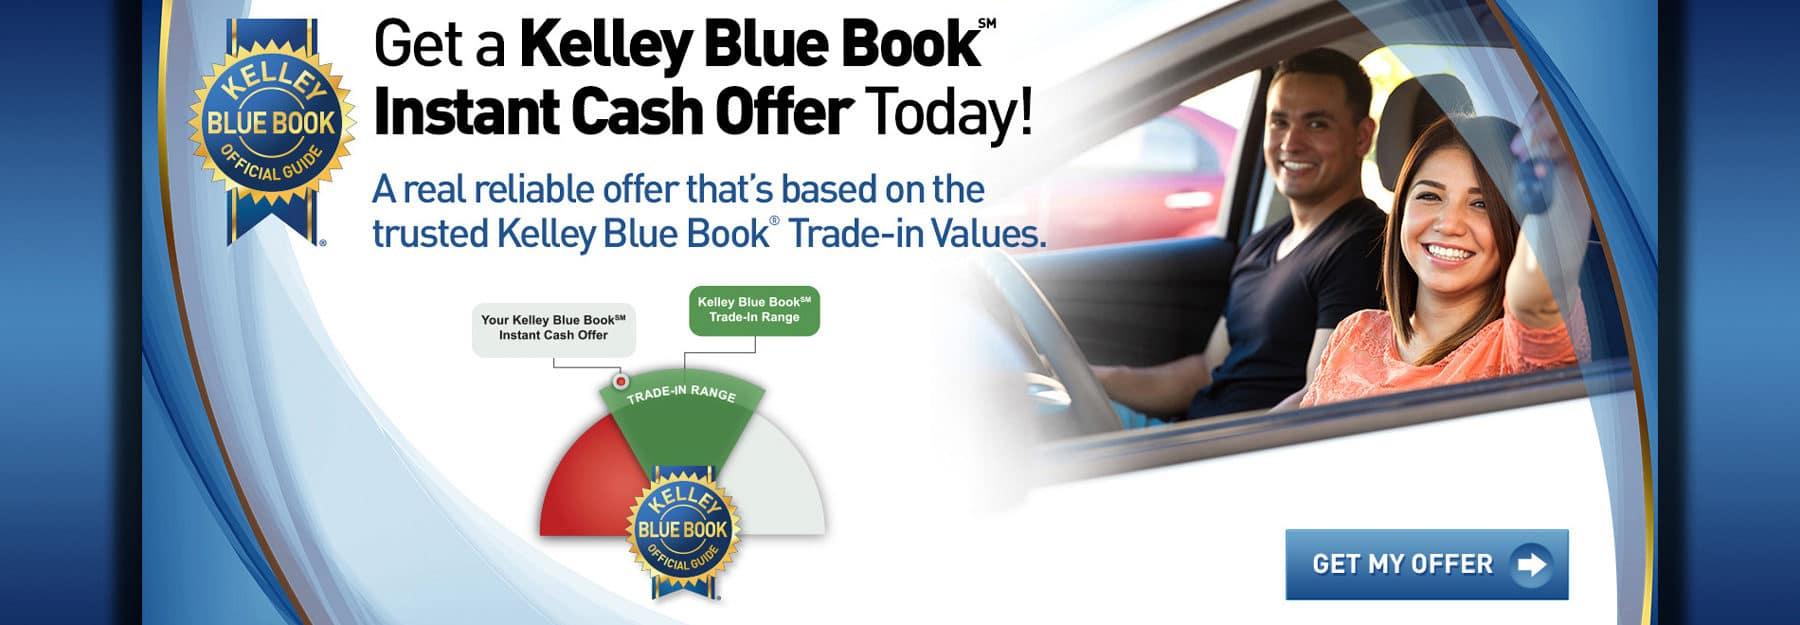 https://www.kbb.com/instant-cash-offer/W/69486803/43A6F9B8-DB6C-48C0-A360-F658B2176E3E/